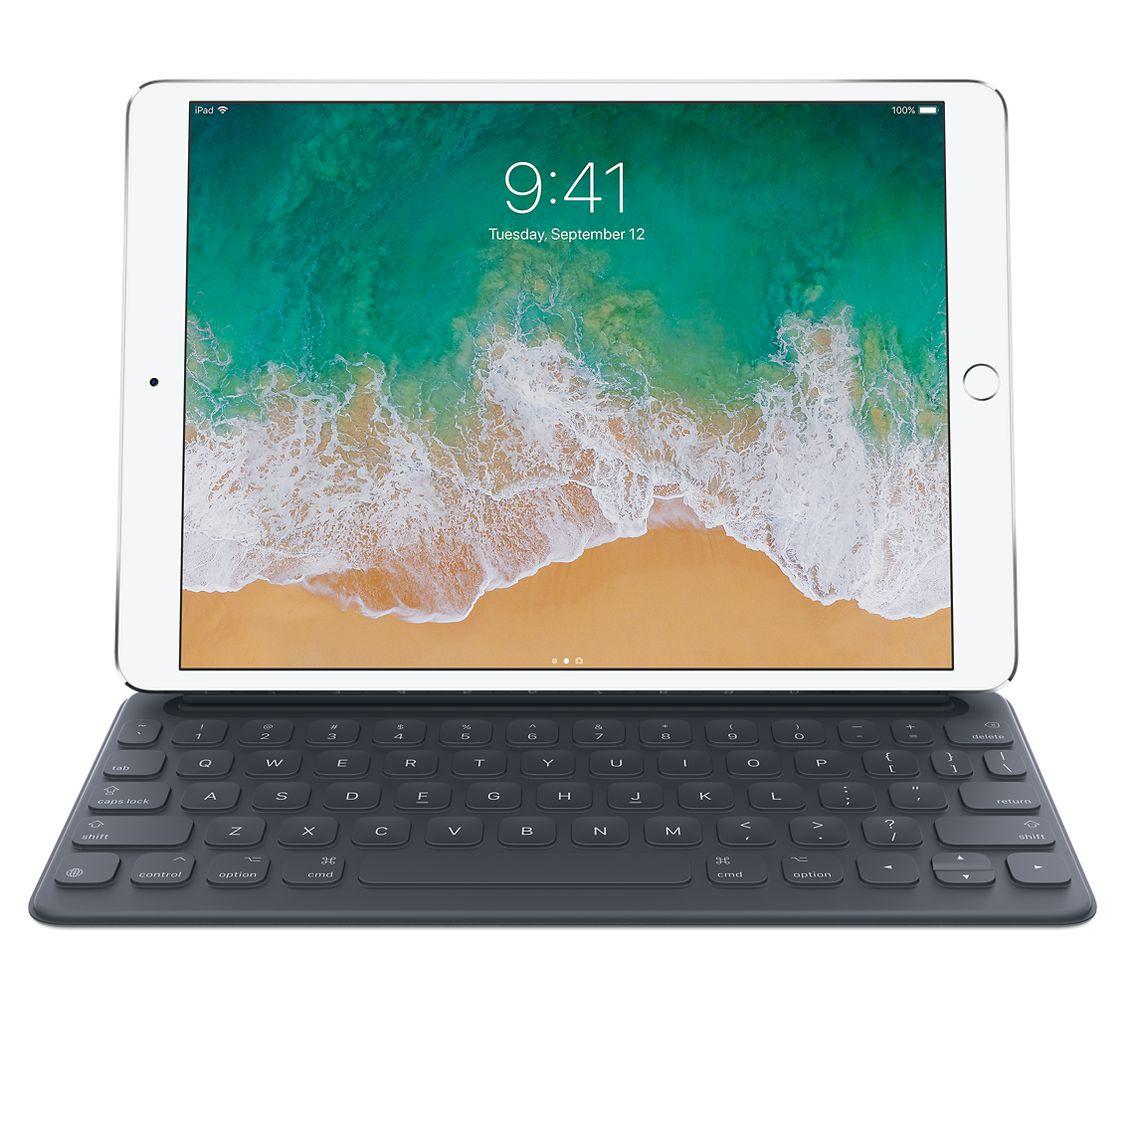 Refurbished 10 5 Inch Ipad Pro Wi Fi Cellular 512gb Space Grey Apple Ie